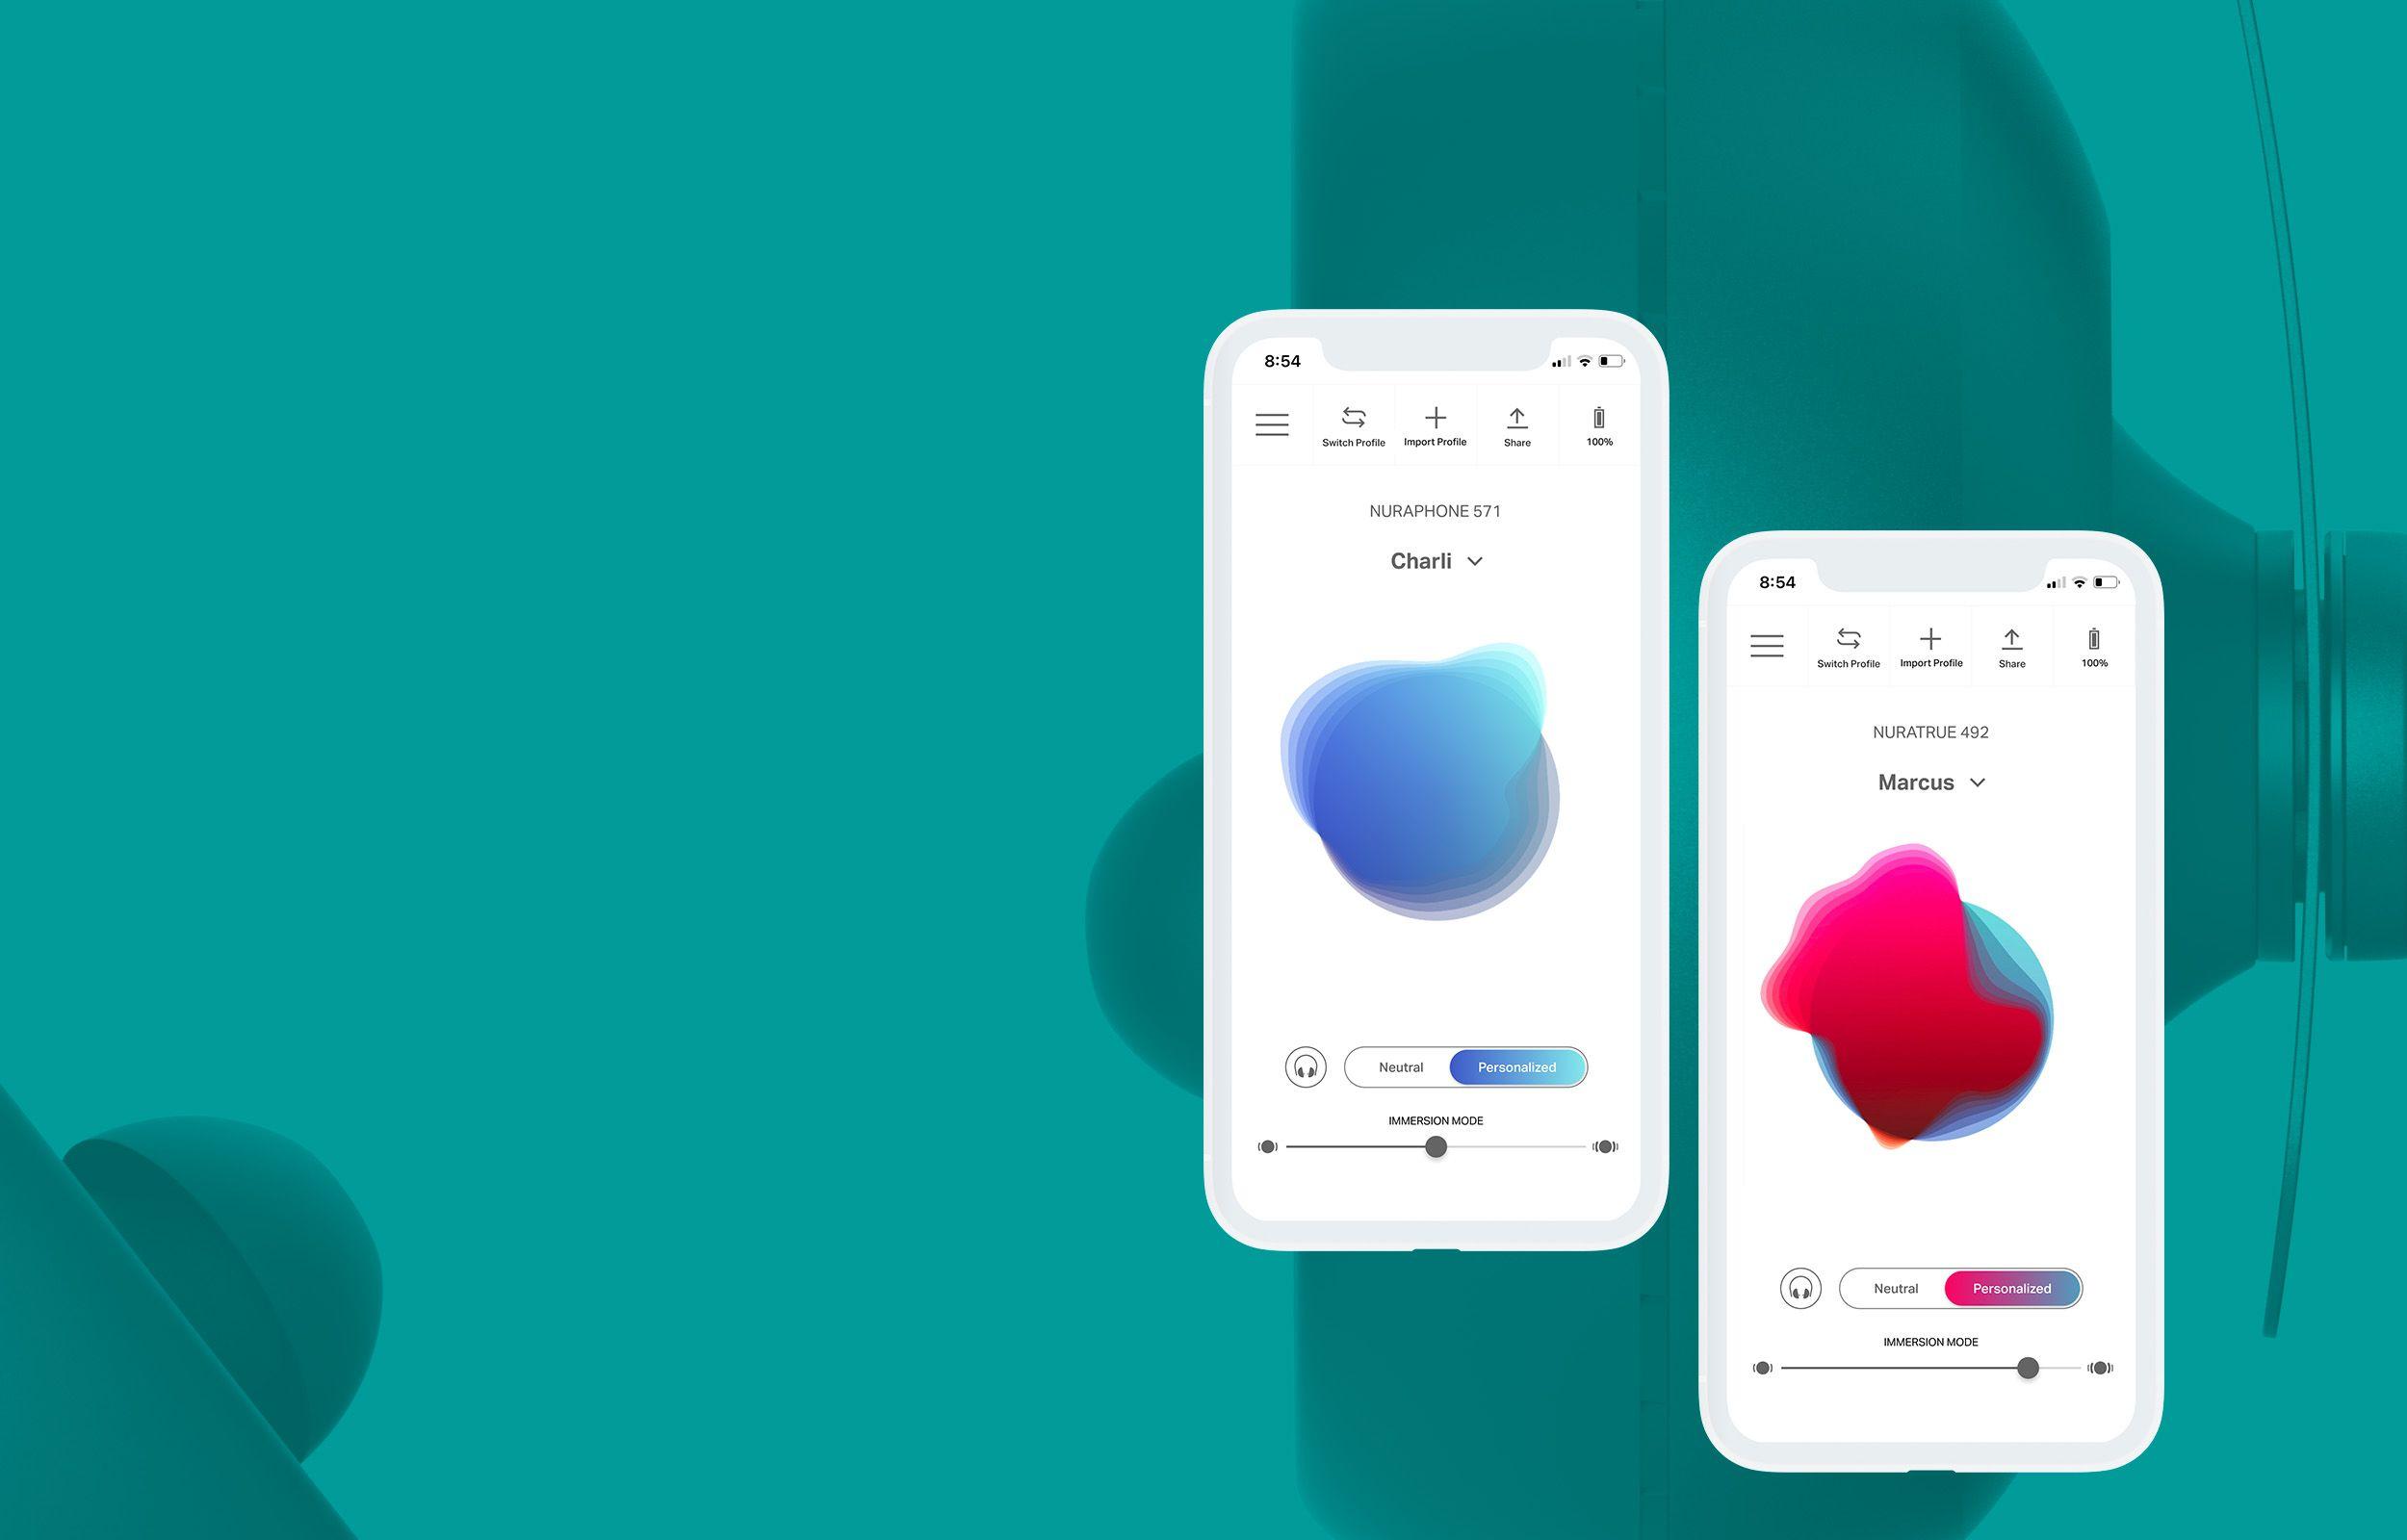 Hero image of NURAPHONE headphones overlaying solid-coloured background of Nura brand colour, Azure